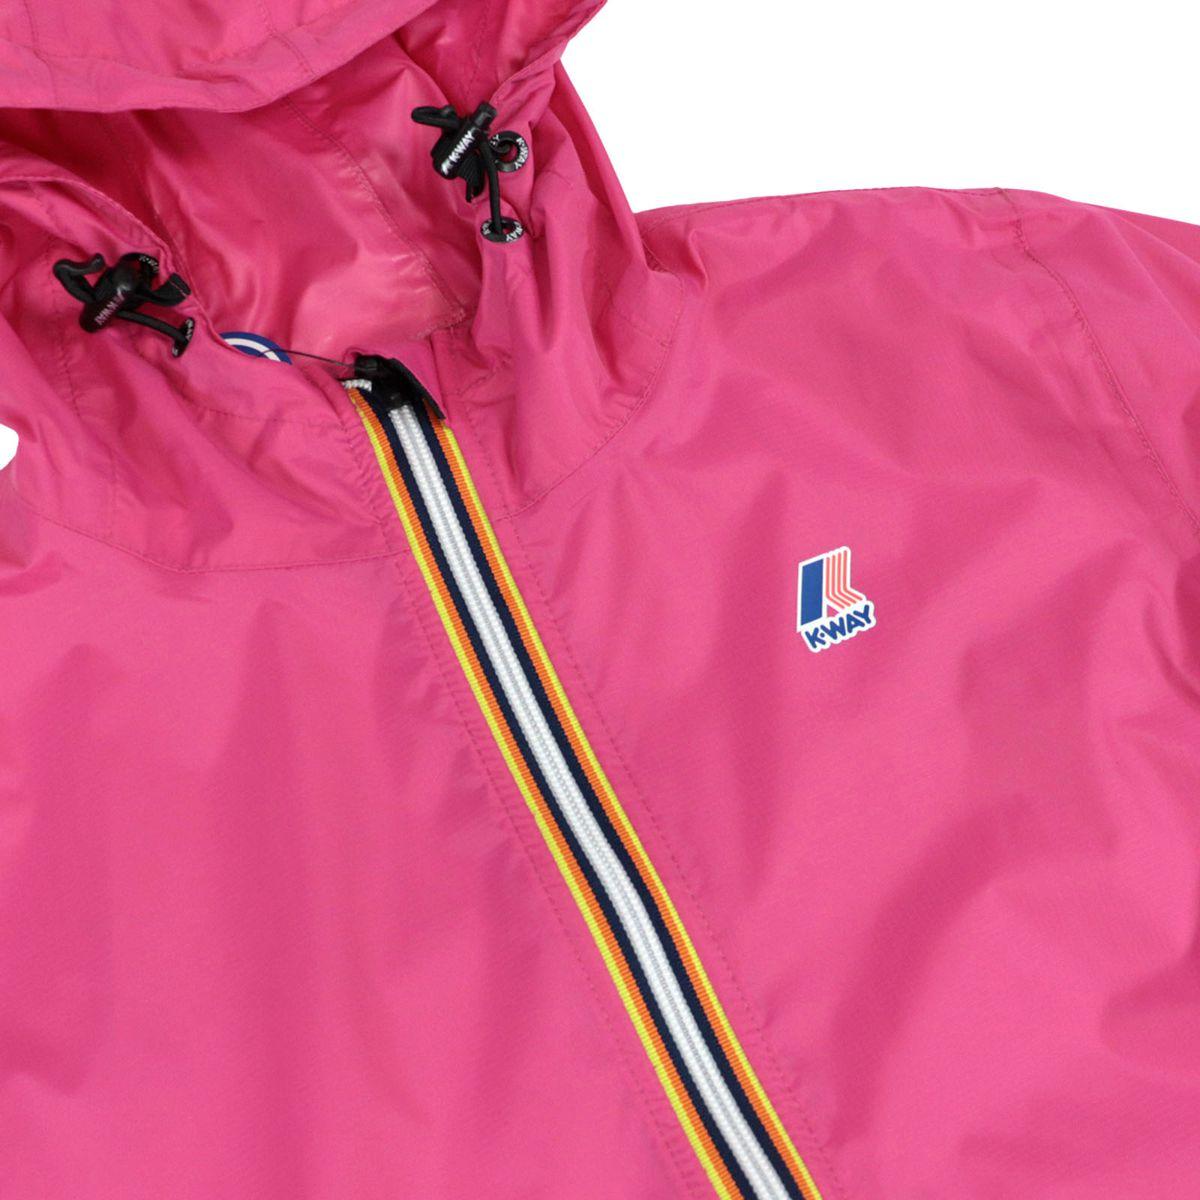 Le Vrai 3.0 Claudette nylon jacket with hood Fuchsia K-Way